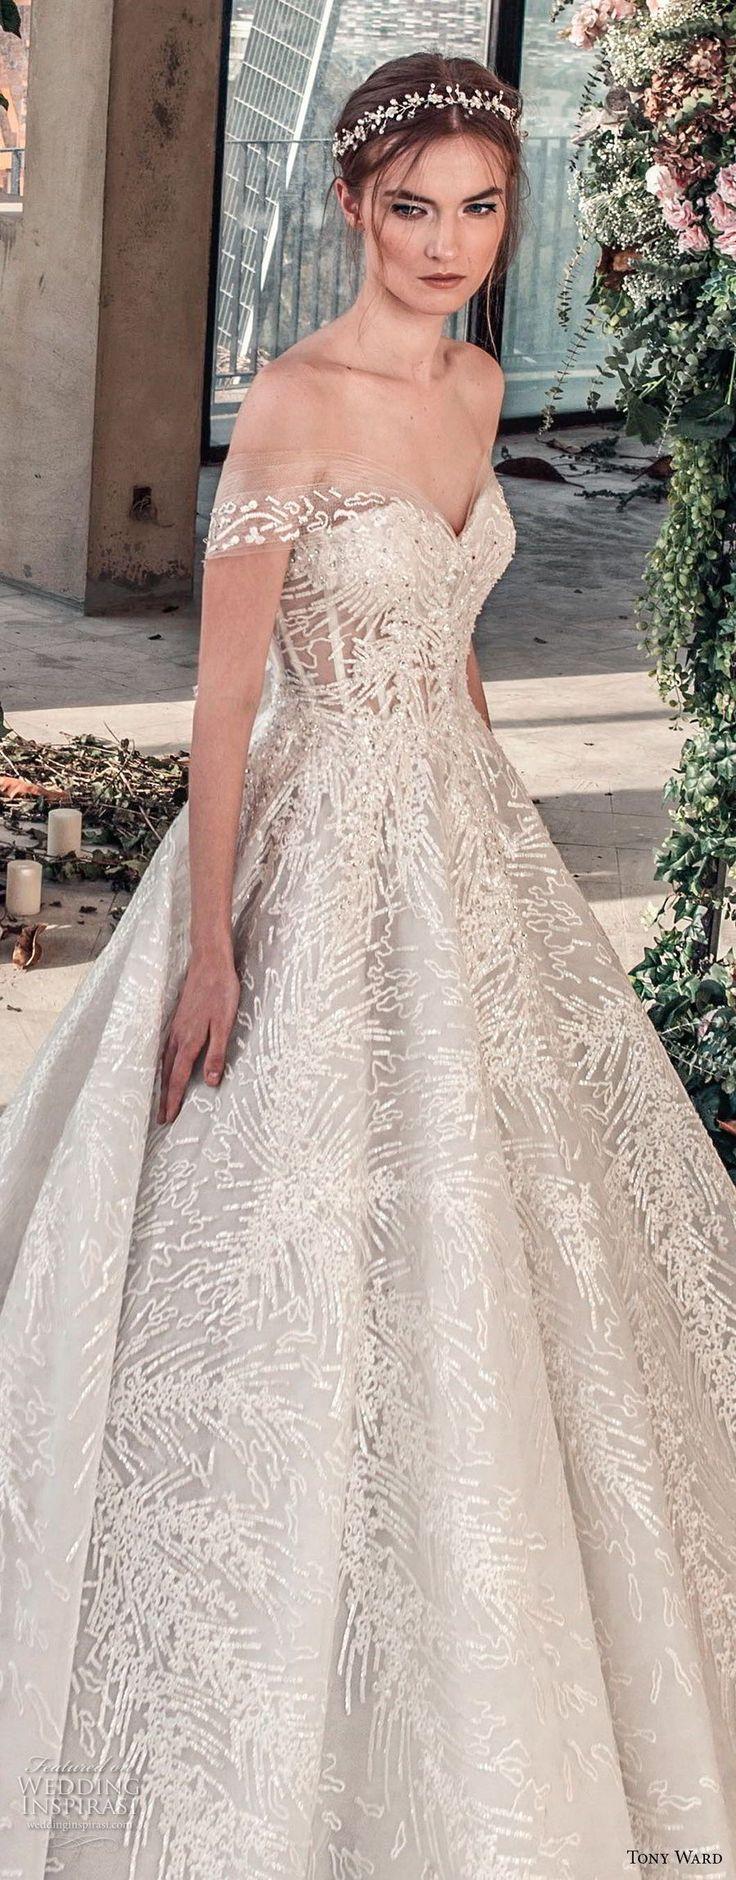 best prom dresses images on pinterest ball dresses ball gown